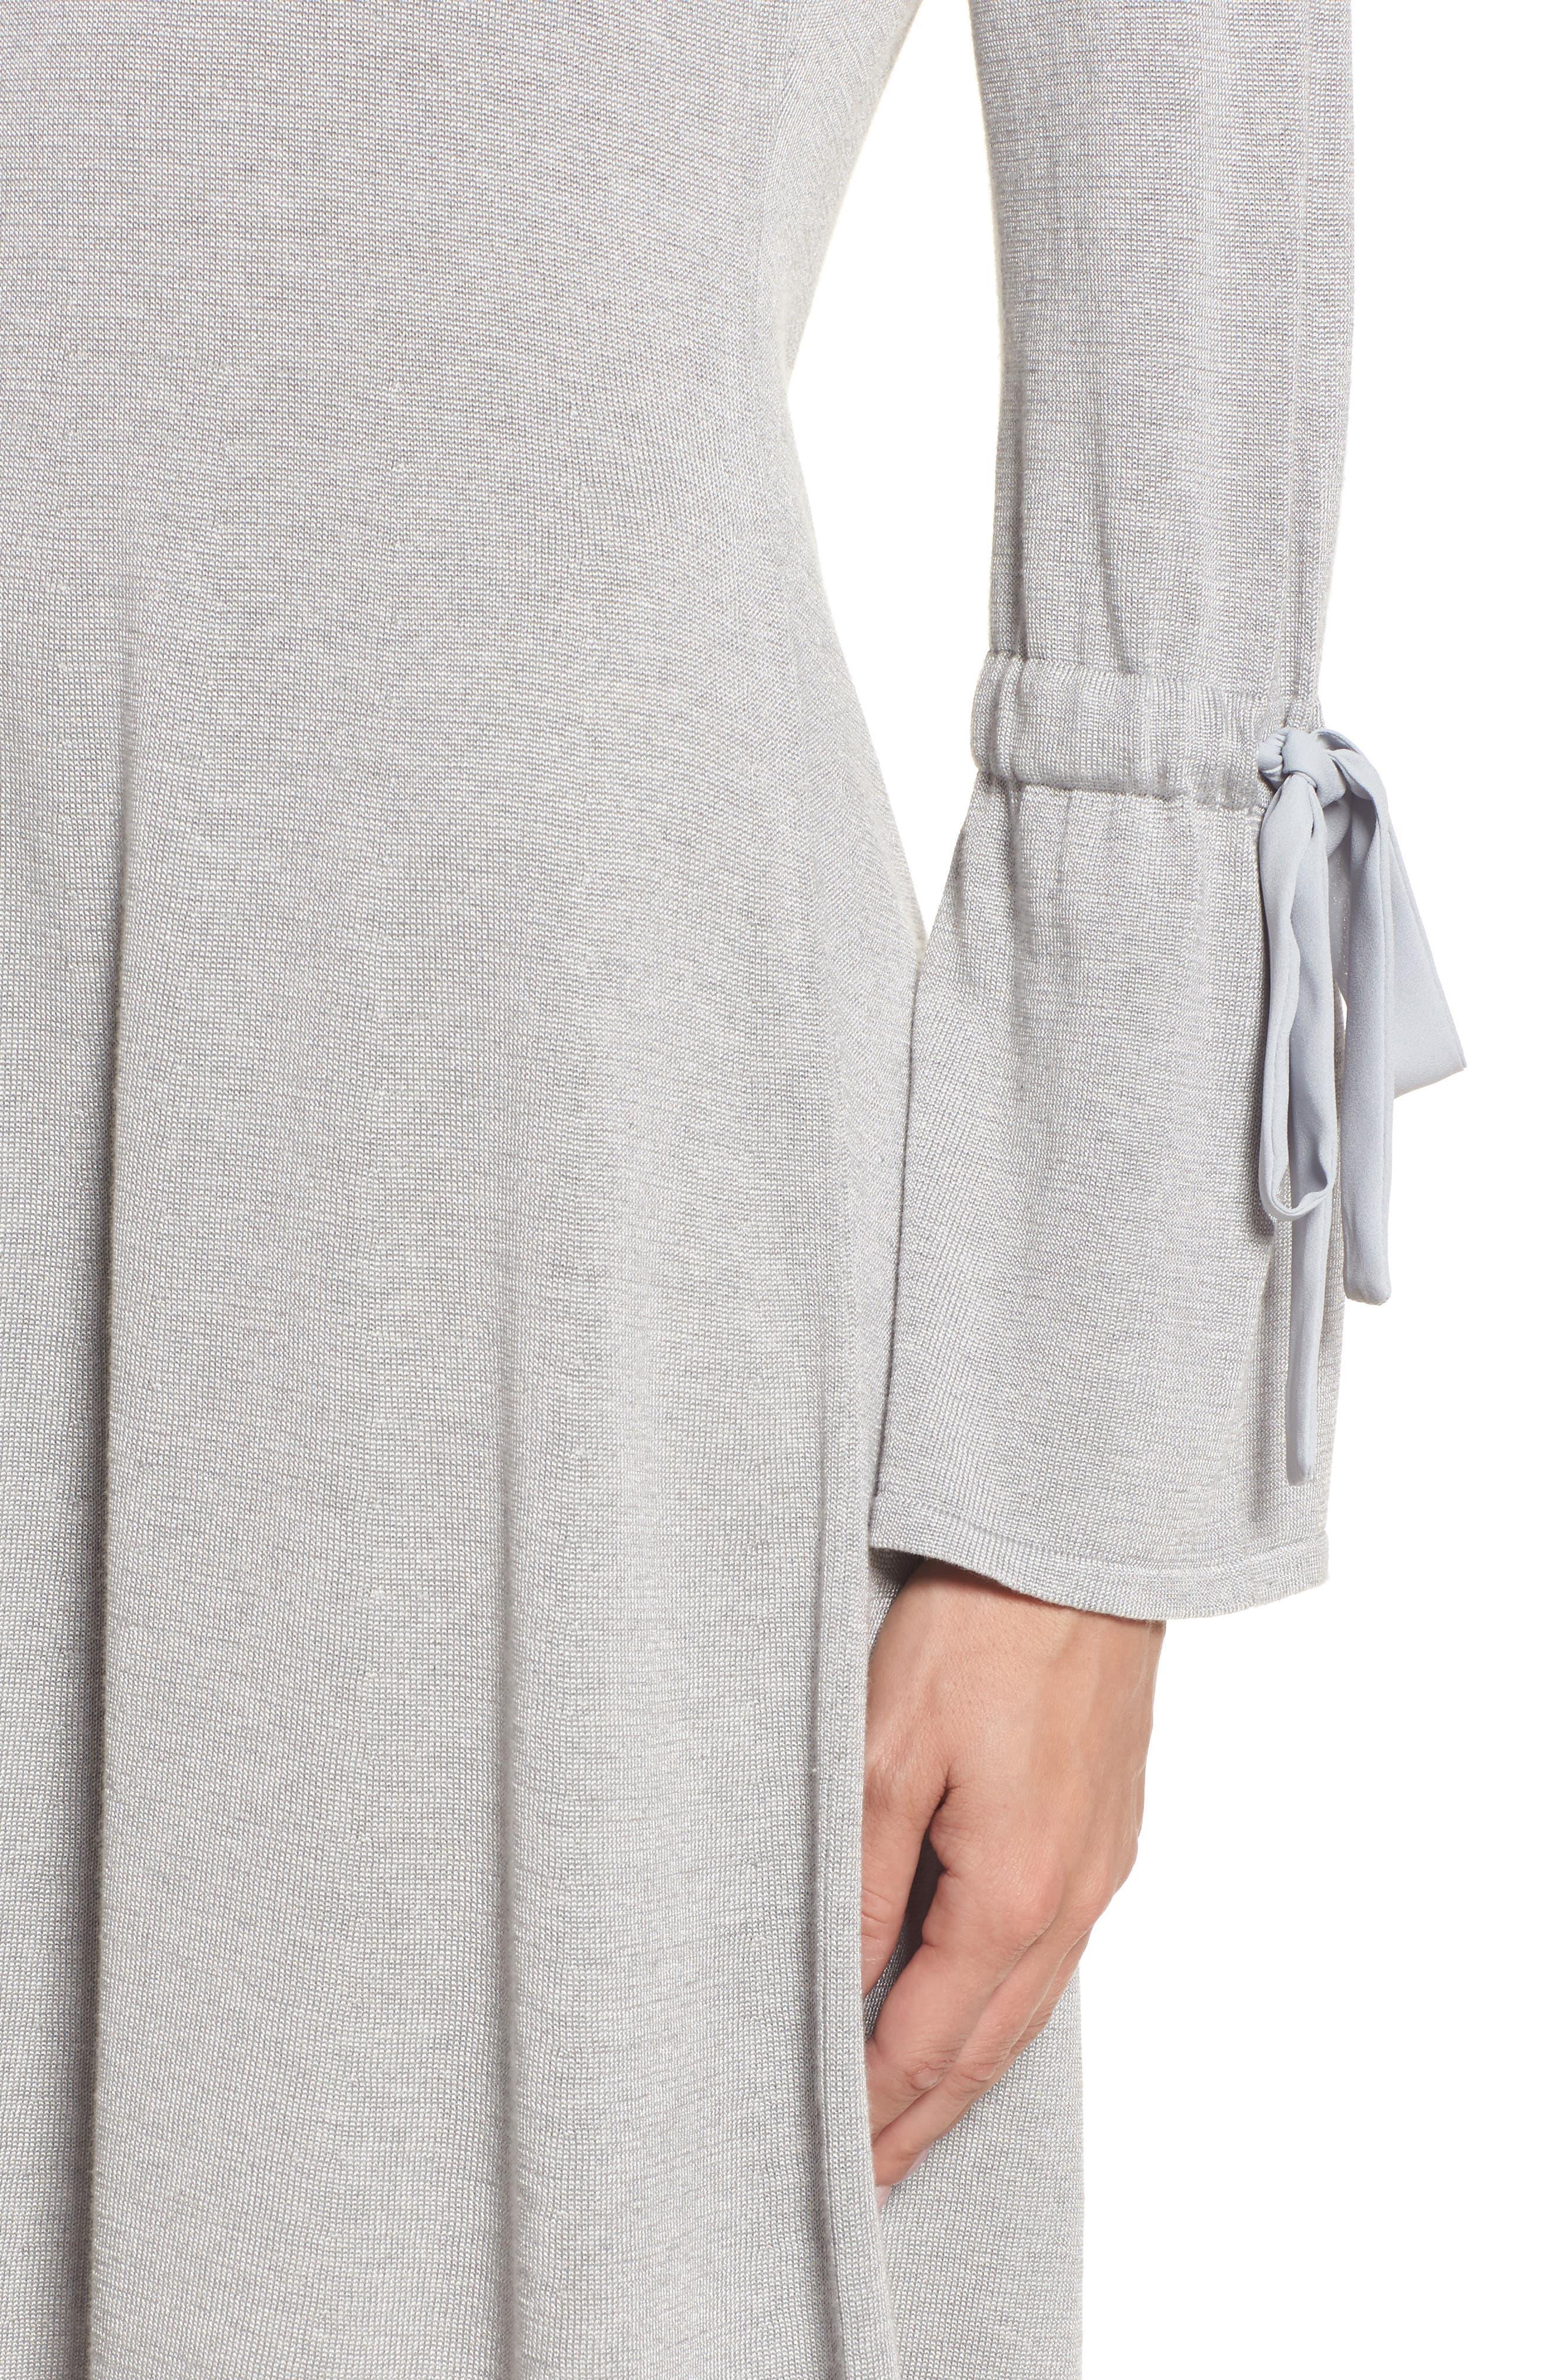 Alternate Image 5  - CeCe Bell Sleeve Sweater Dress